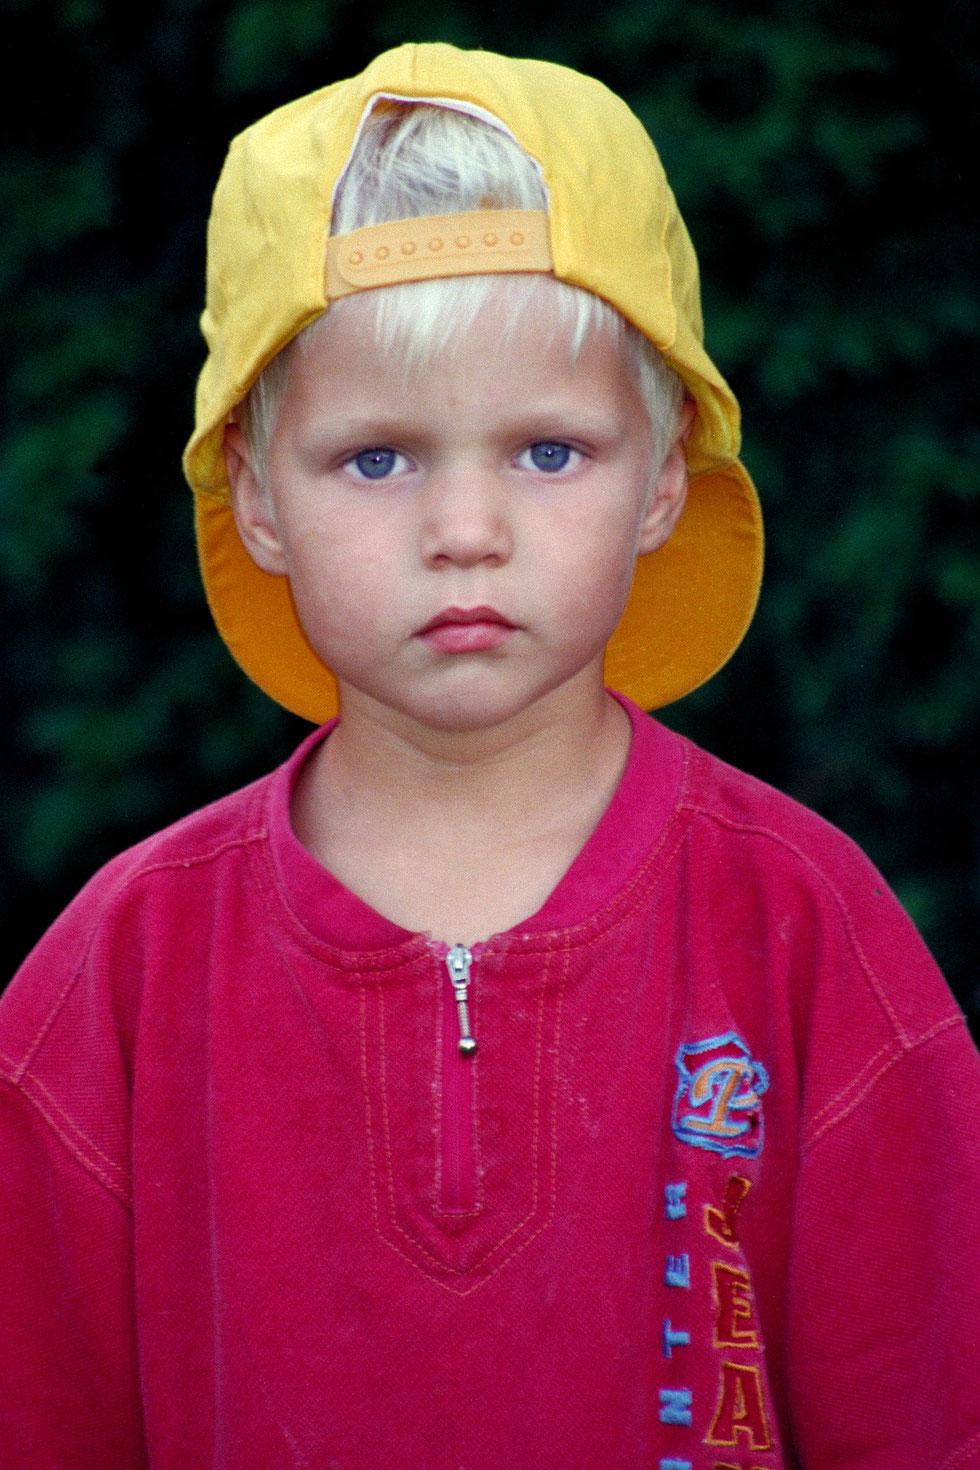 Yellow cap, Jort 1996